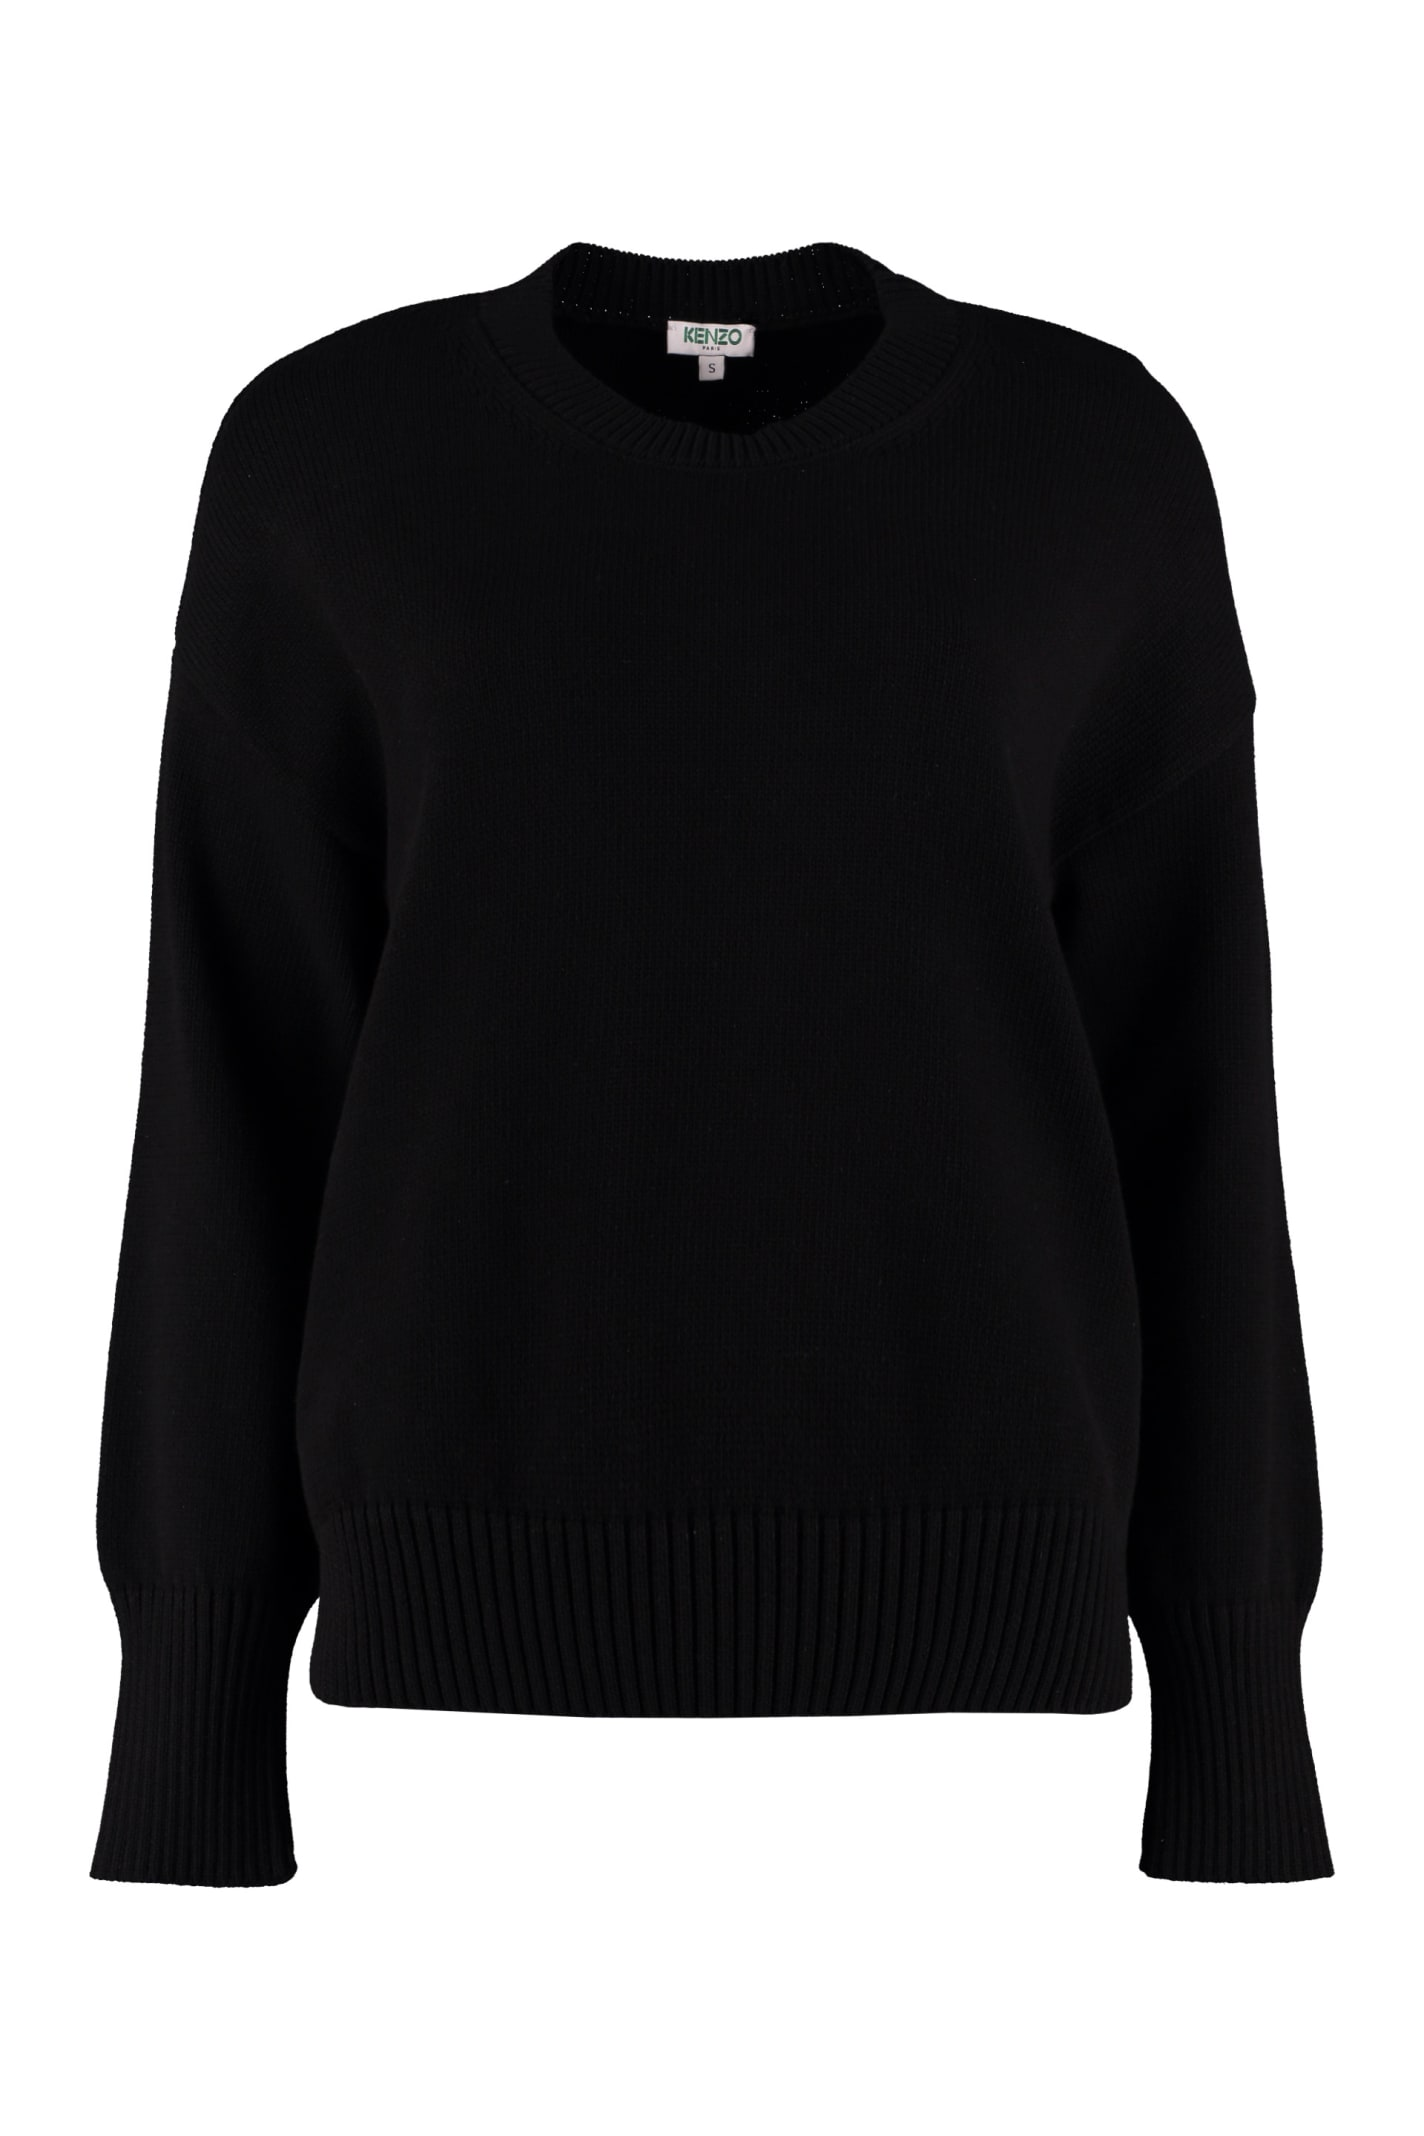 Kenzo Crew-neck Cotton Blend Sweater